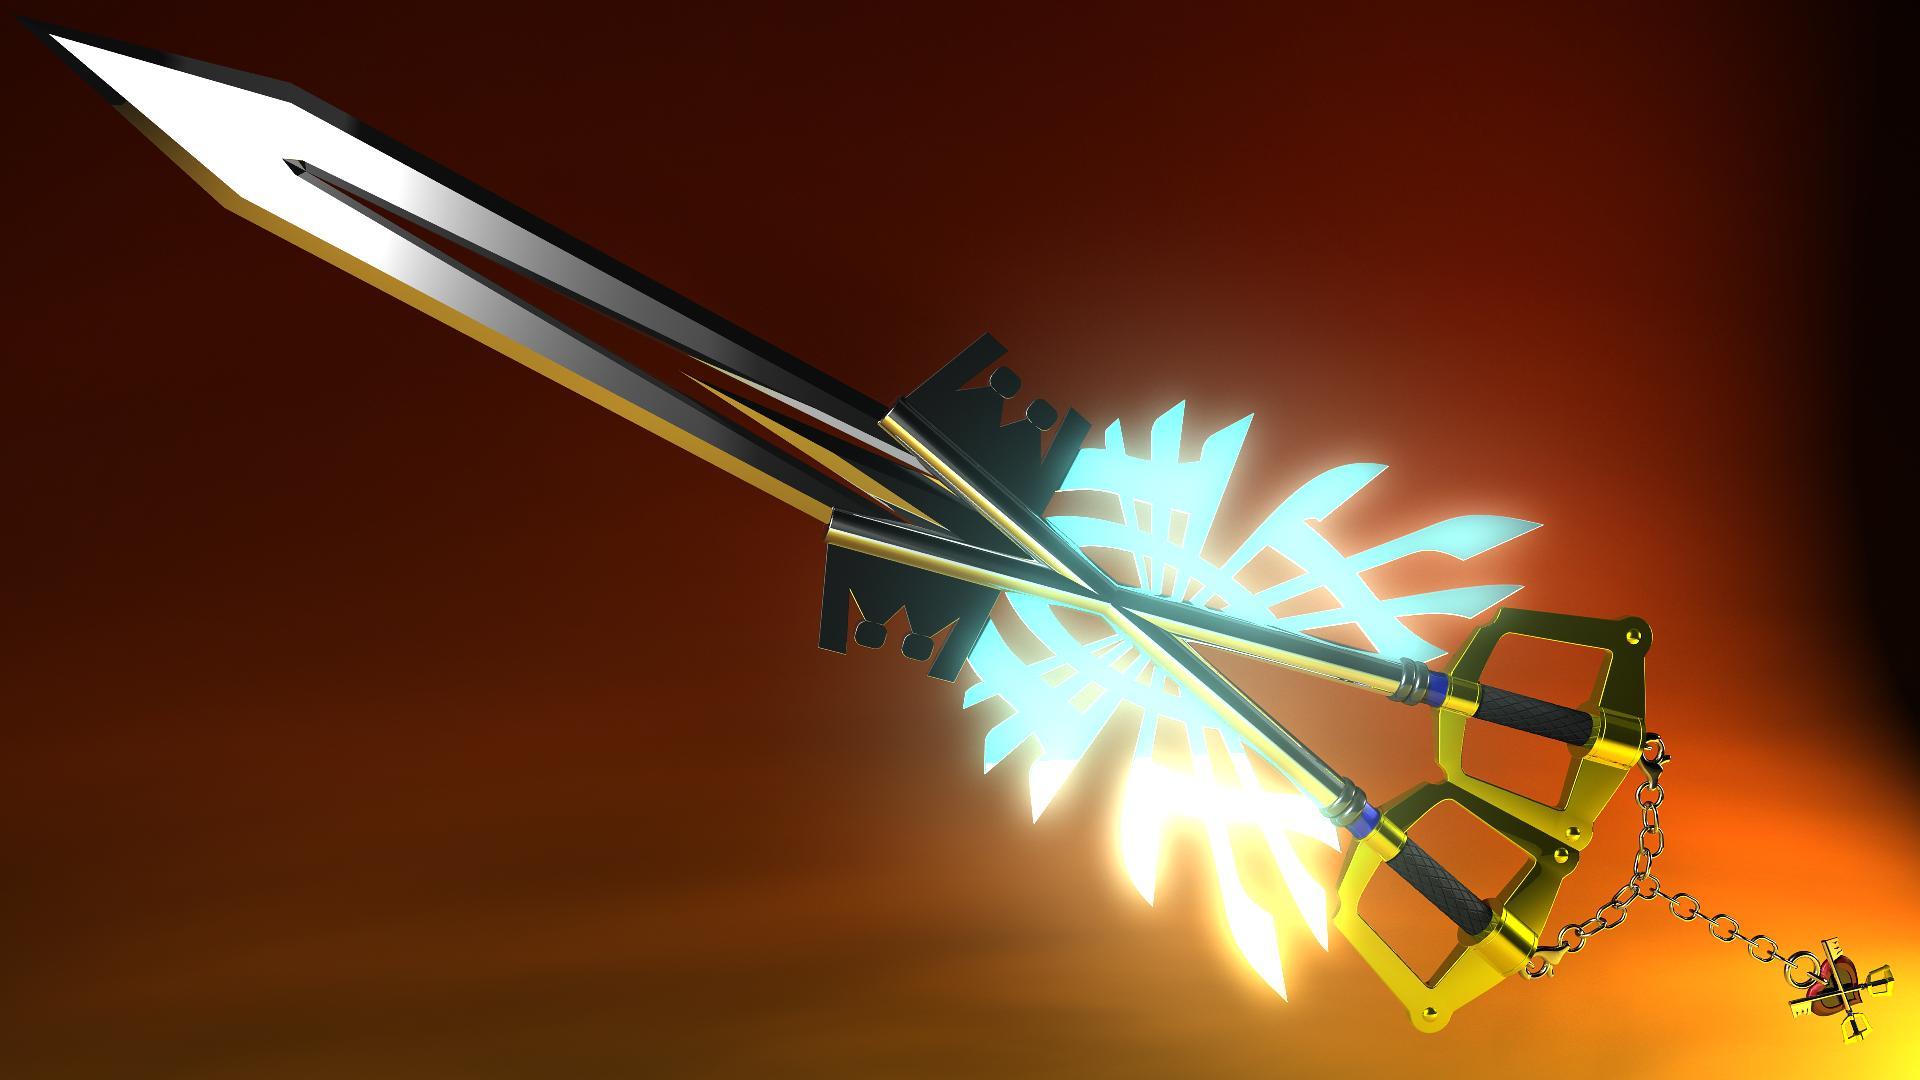 Kingdom Hearts Keyblade Wallpaper Hd